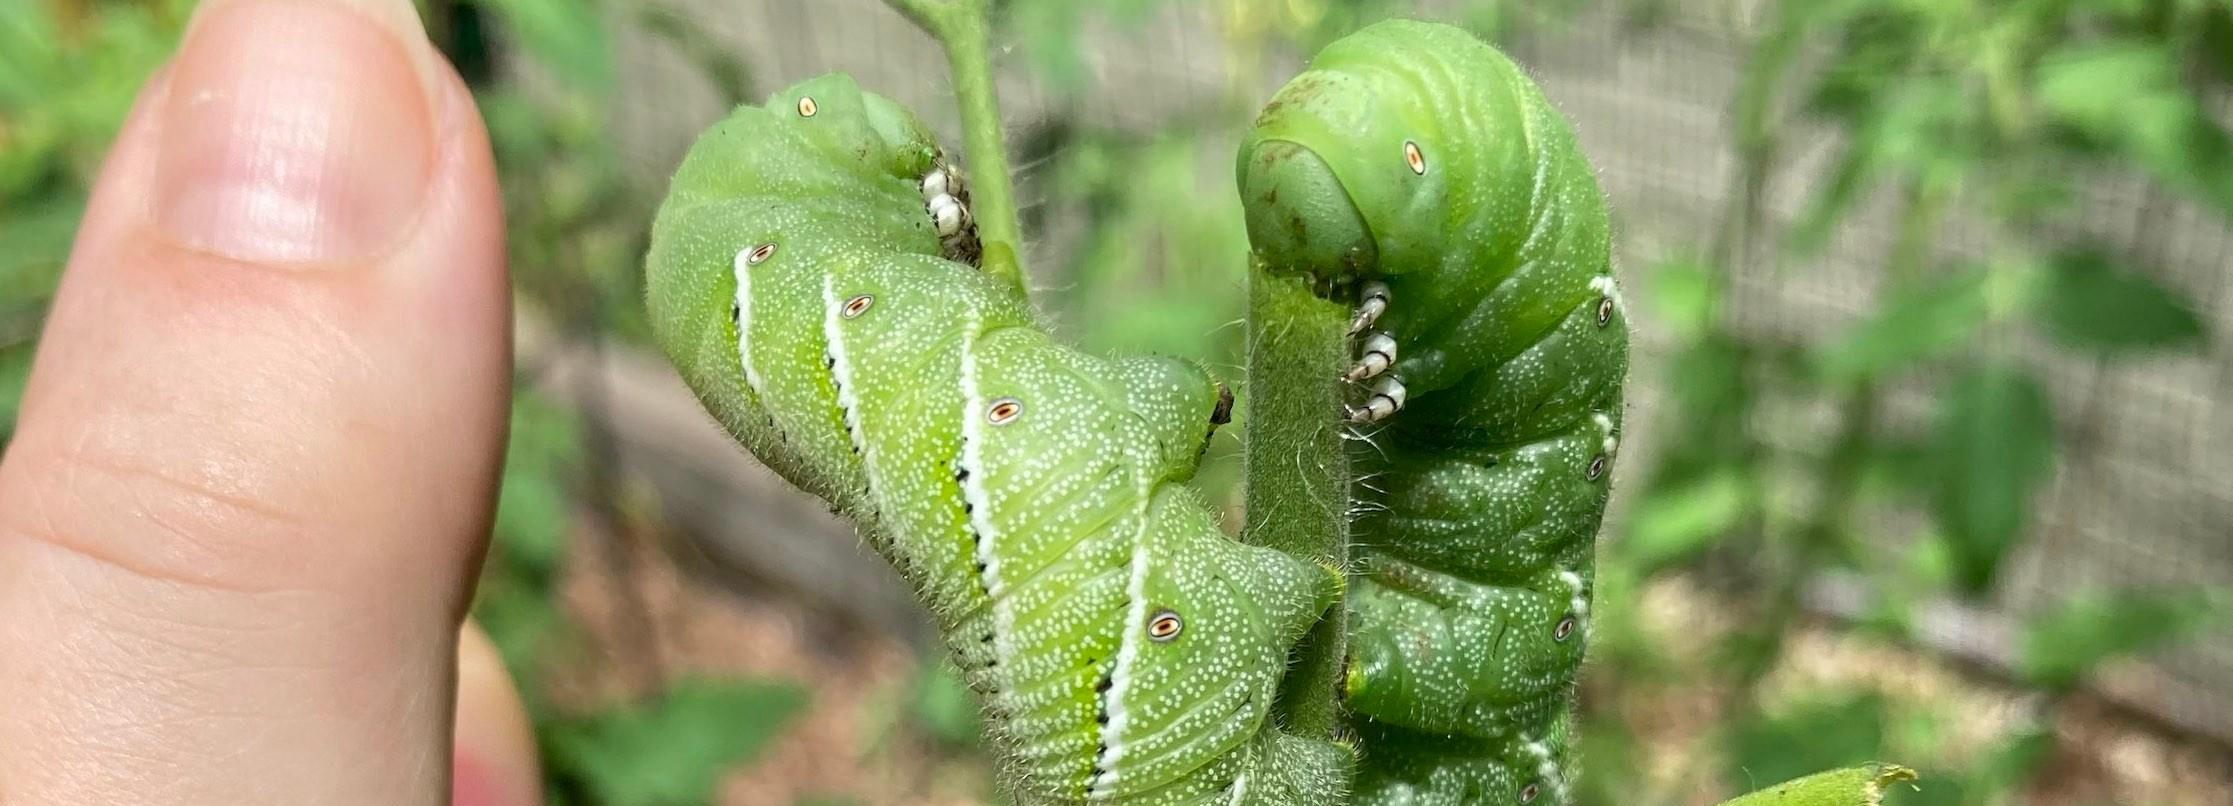 tomato hornworm caterpillars